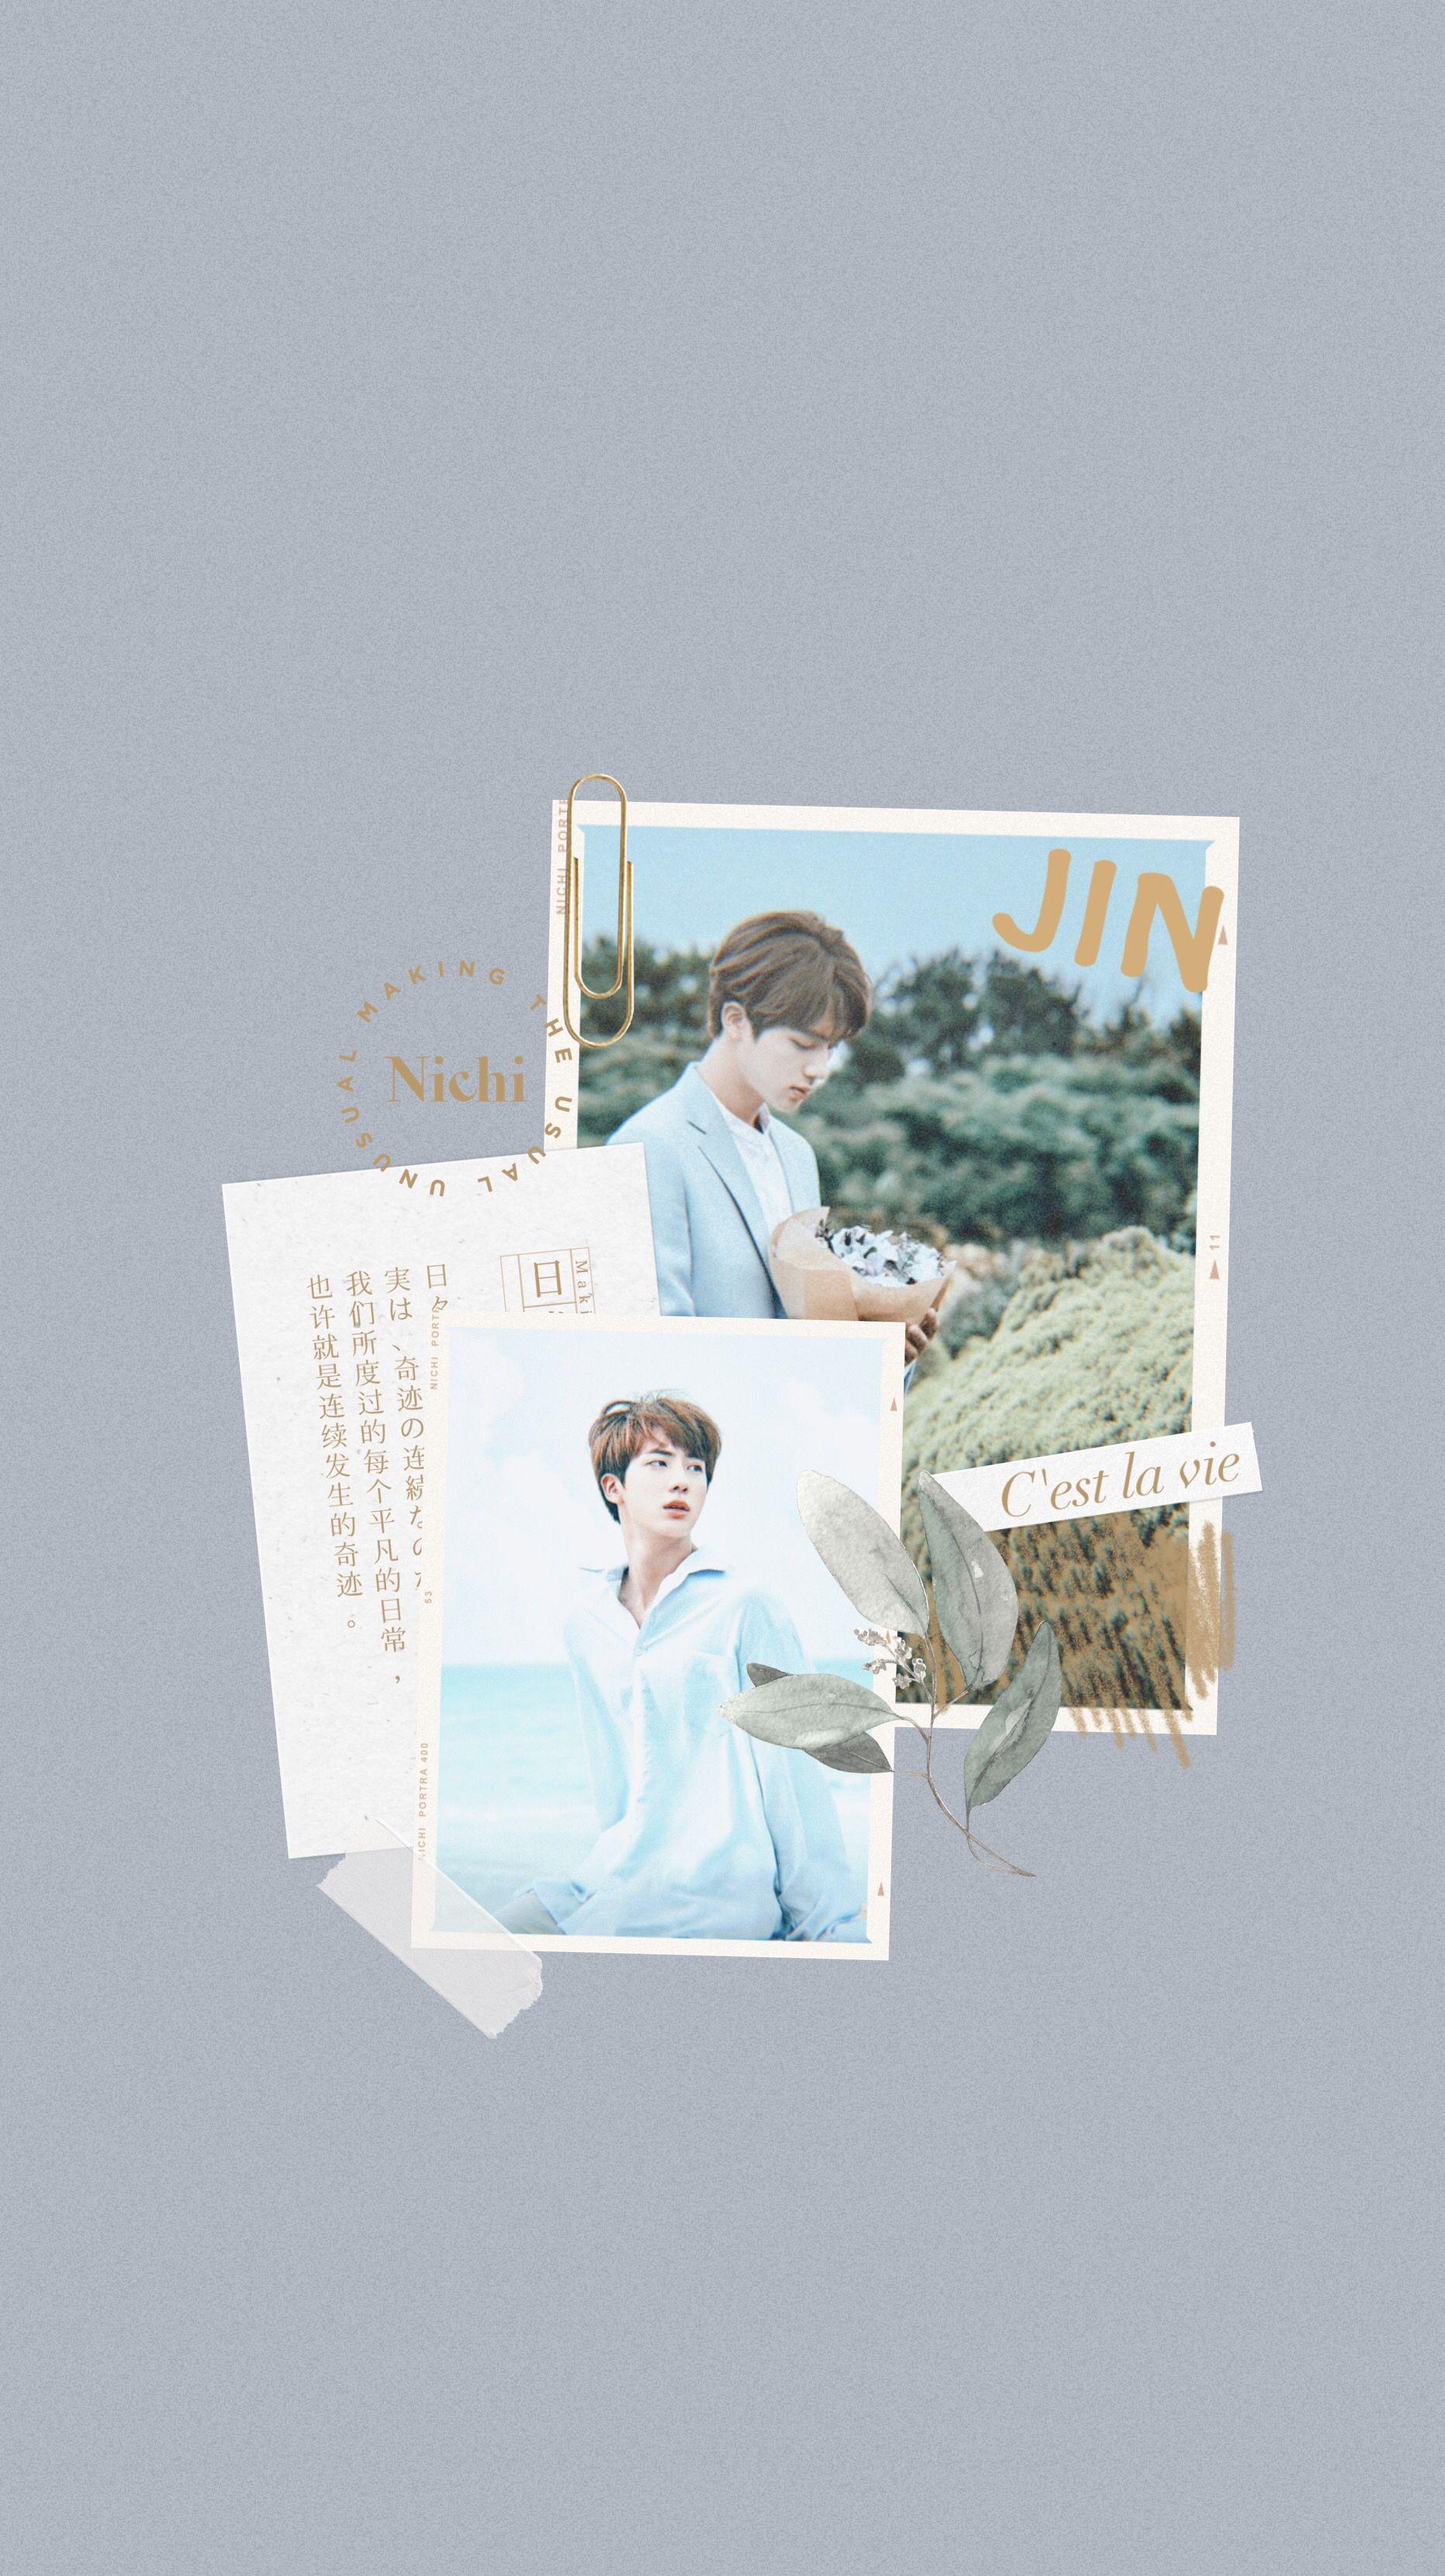 Bts jin wallpaper aesthetic